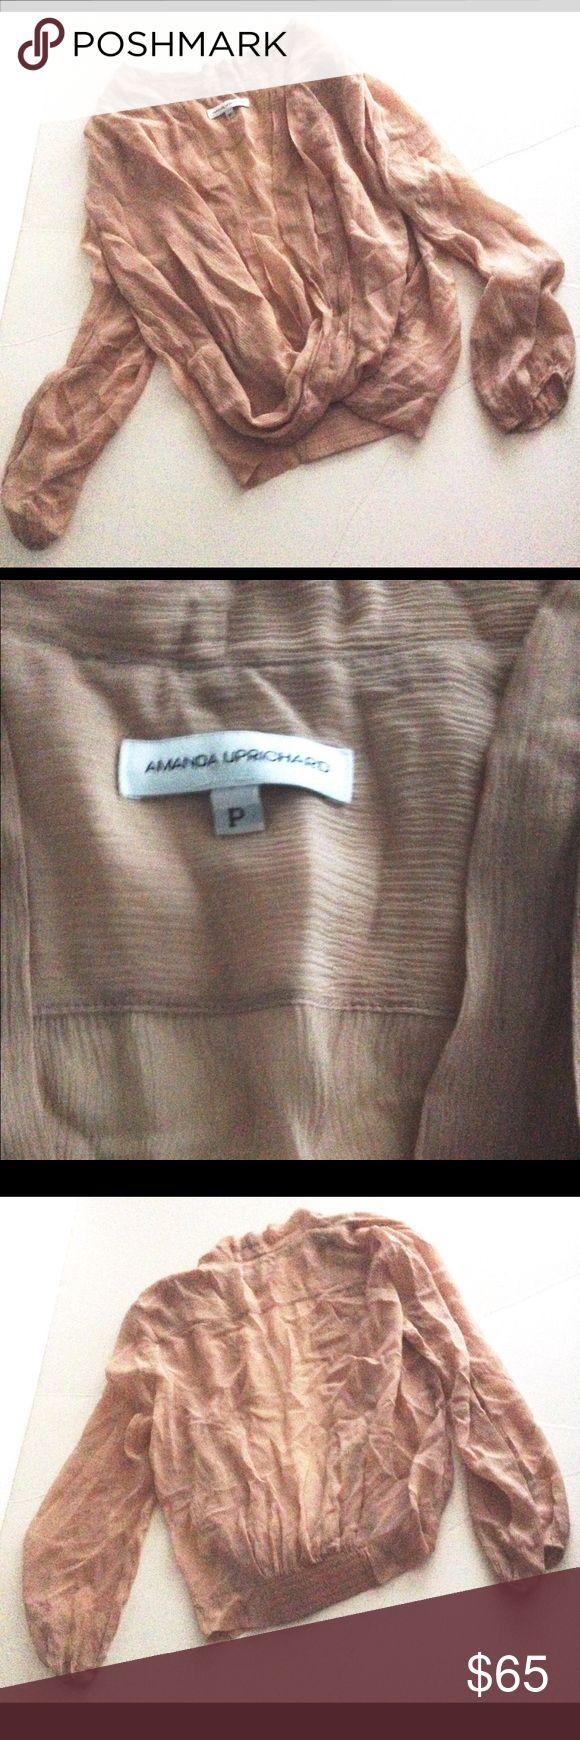 Amanda Uprichard faux wrap open style sheer silk Amanda Uprichard faux wrap open style sheer silk Amanda Uprichard Tops Blouses